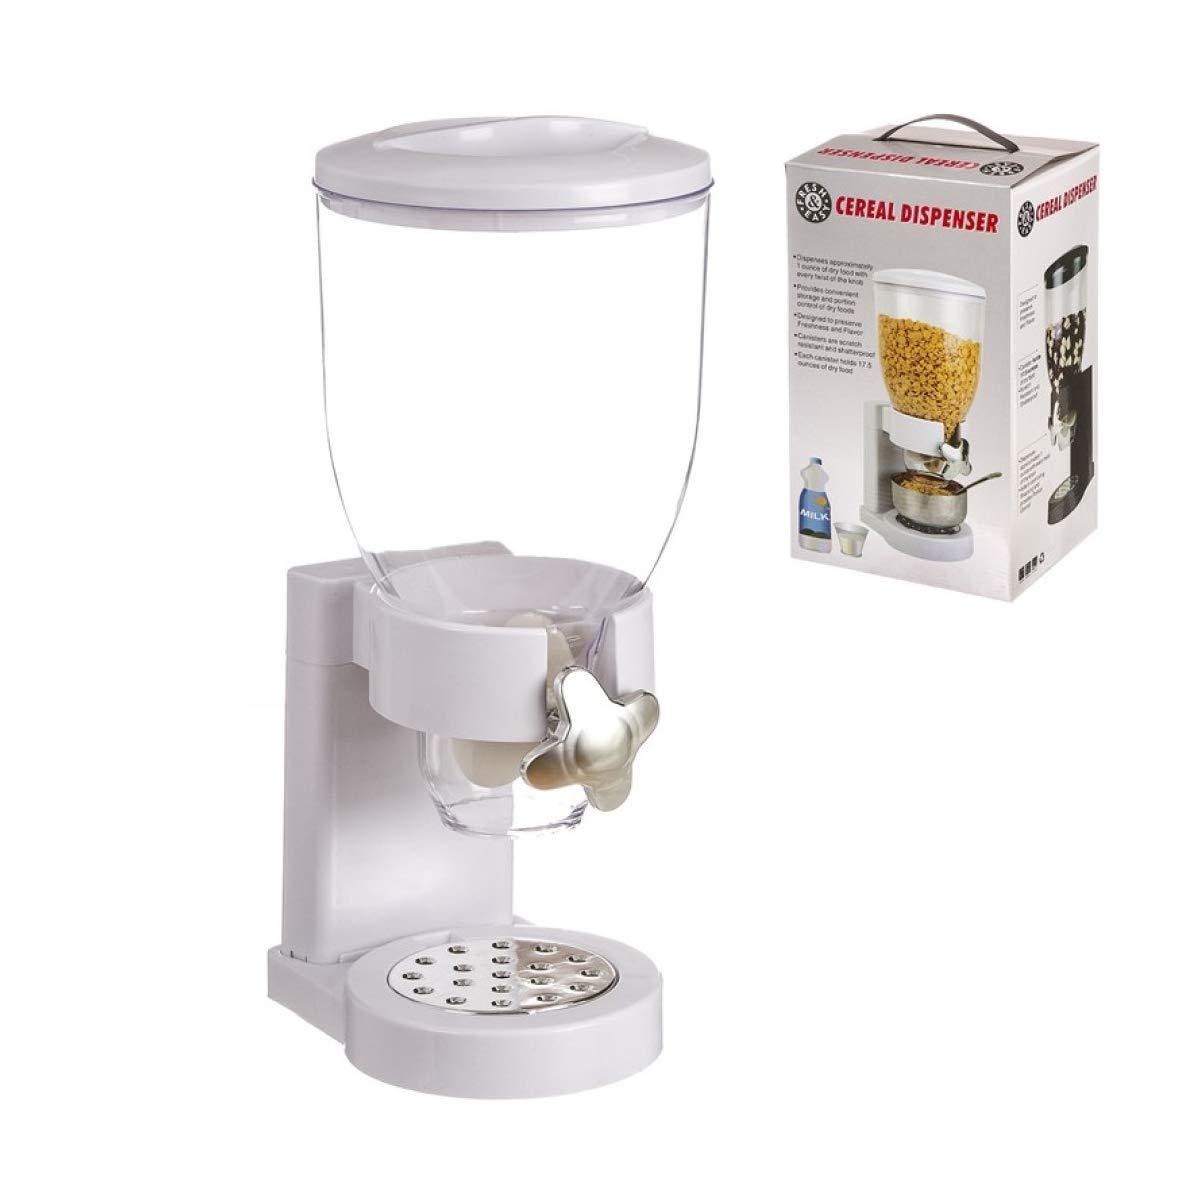 Corn Flakes Frutos Secos Home Gadgets Maquina Dispensador de Cereales Blanco con Dosificador Contenedor Caramelos